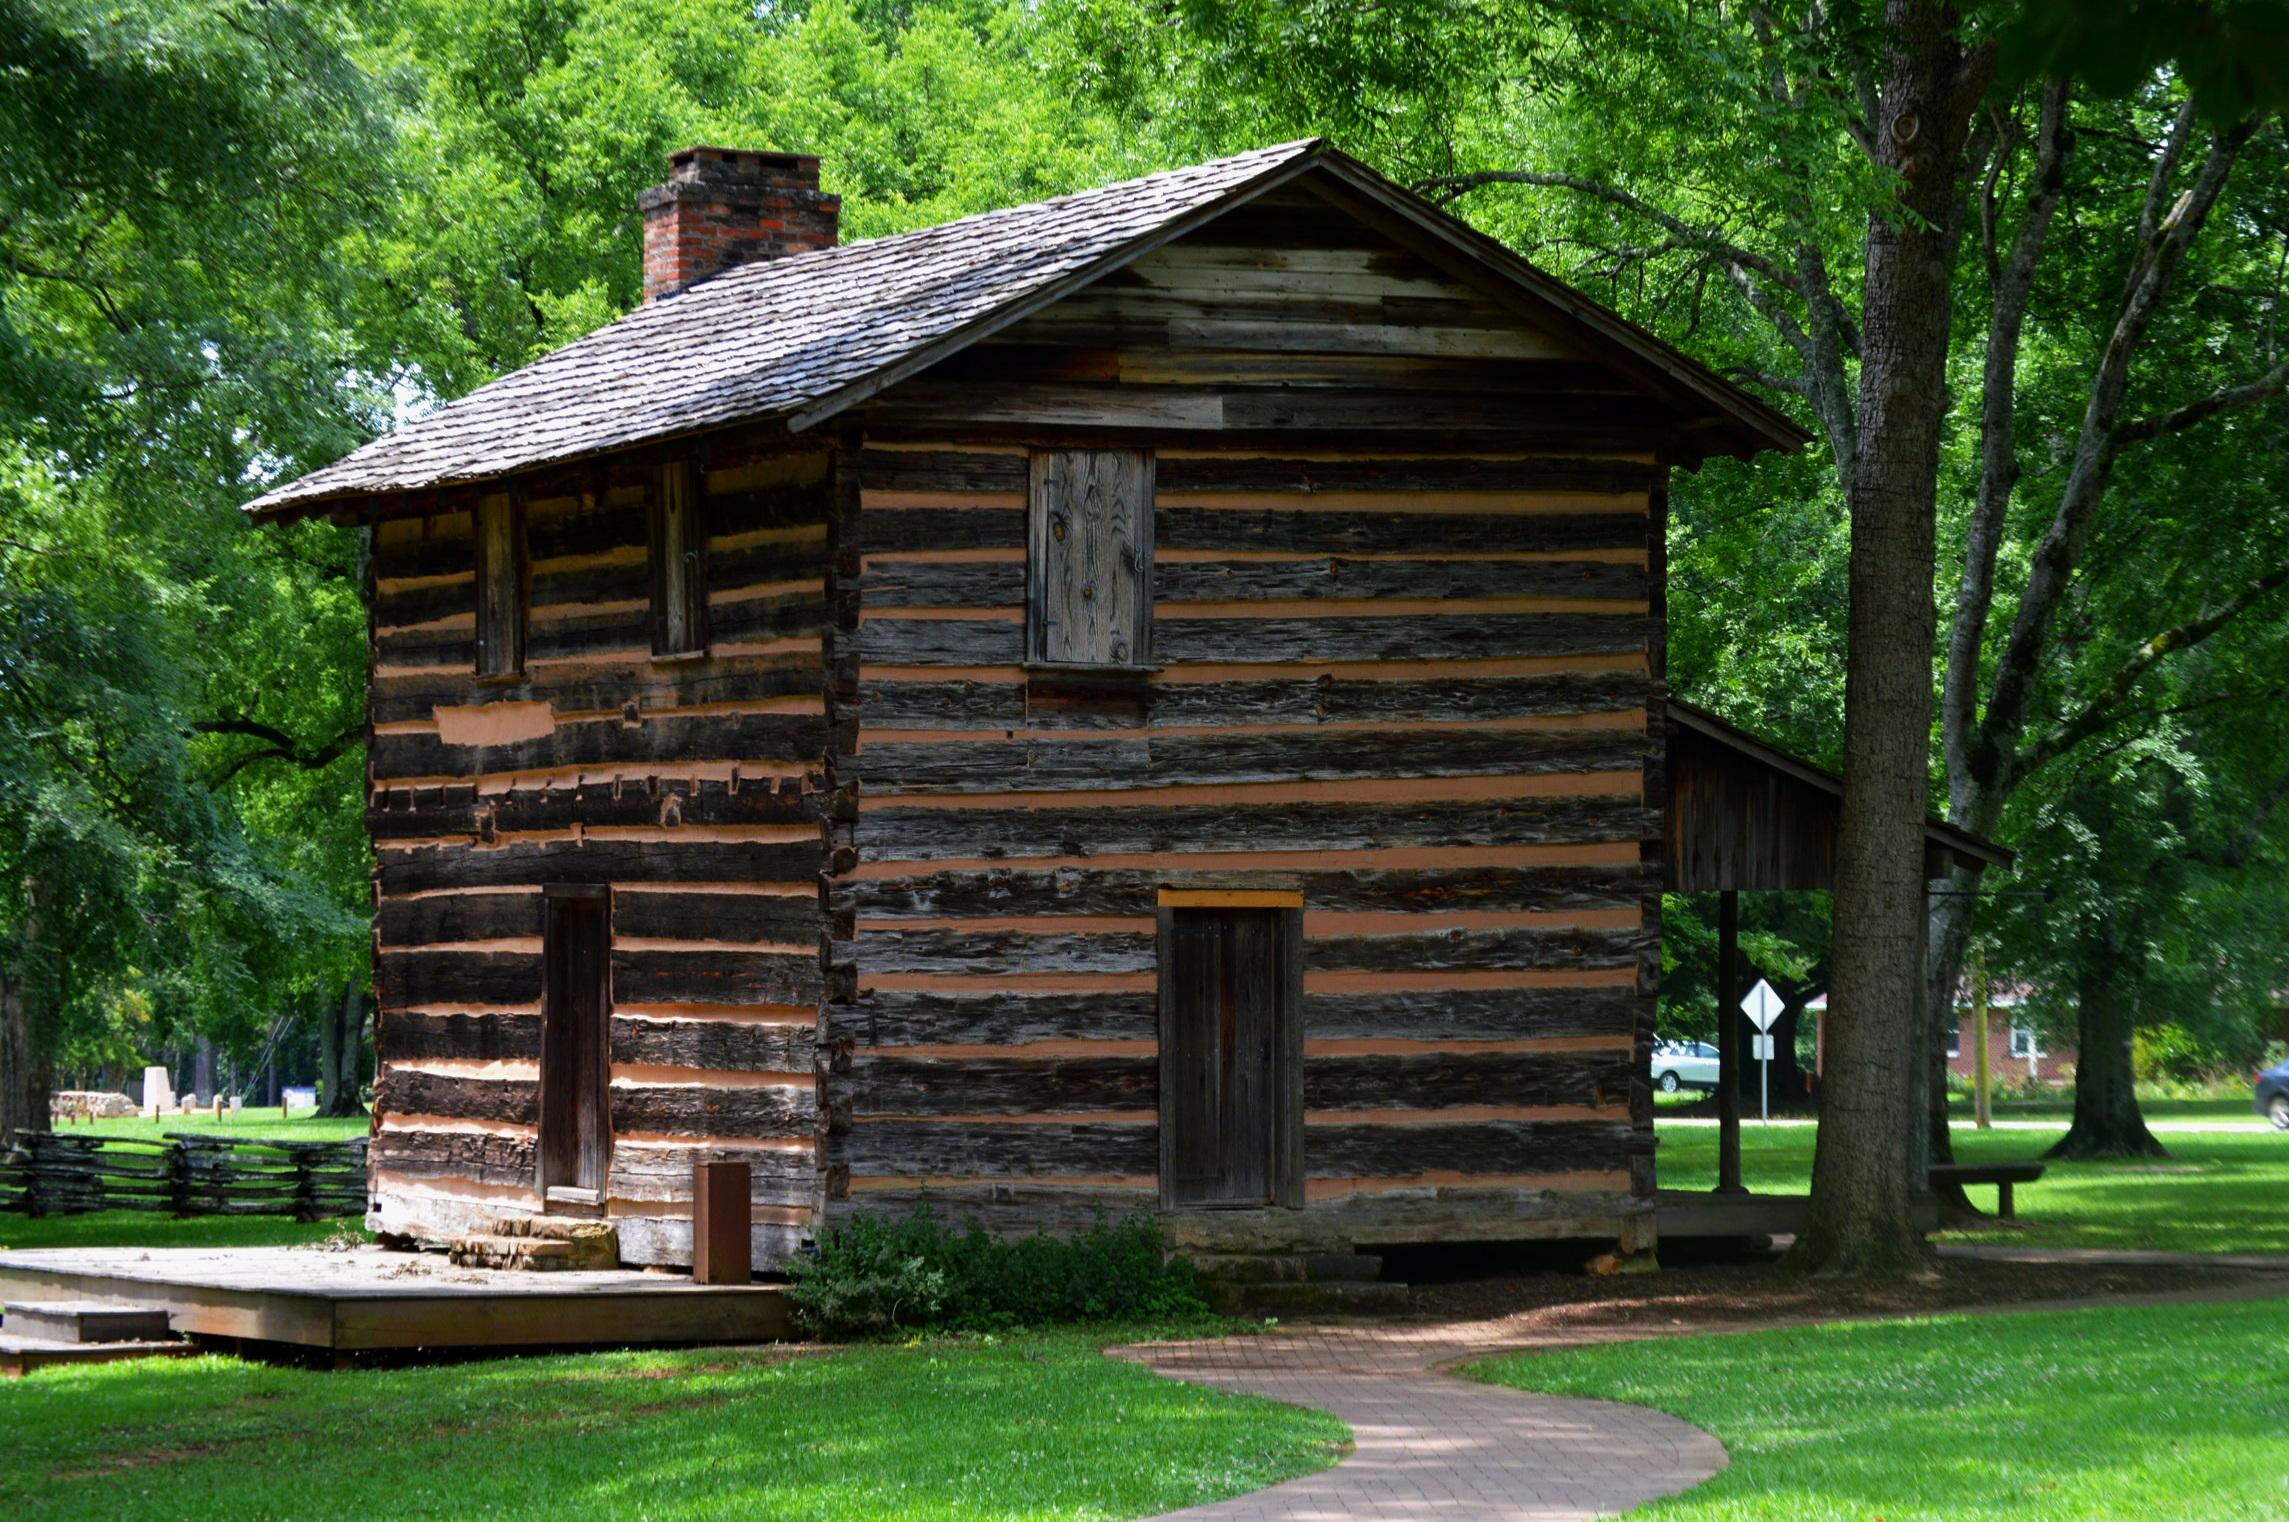 Logan Cabin at Ninety-Six Historic Site